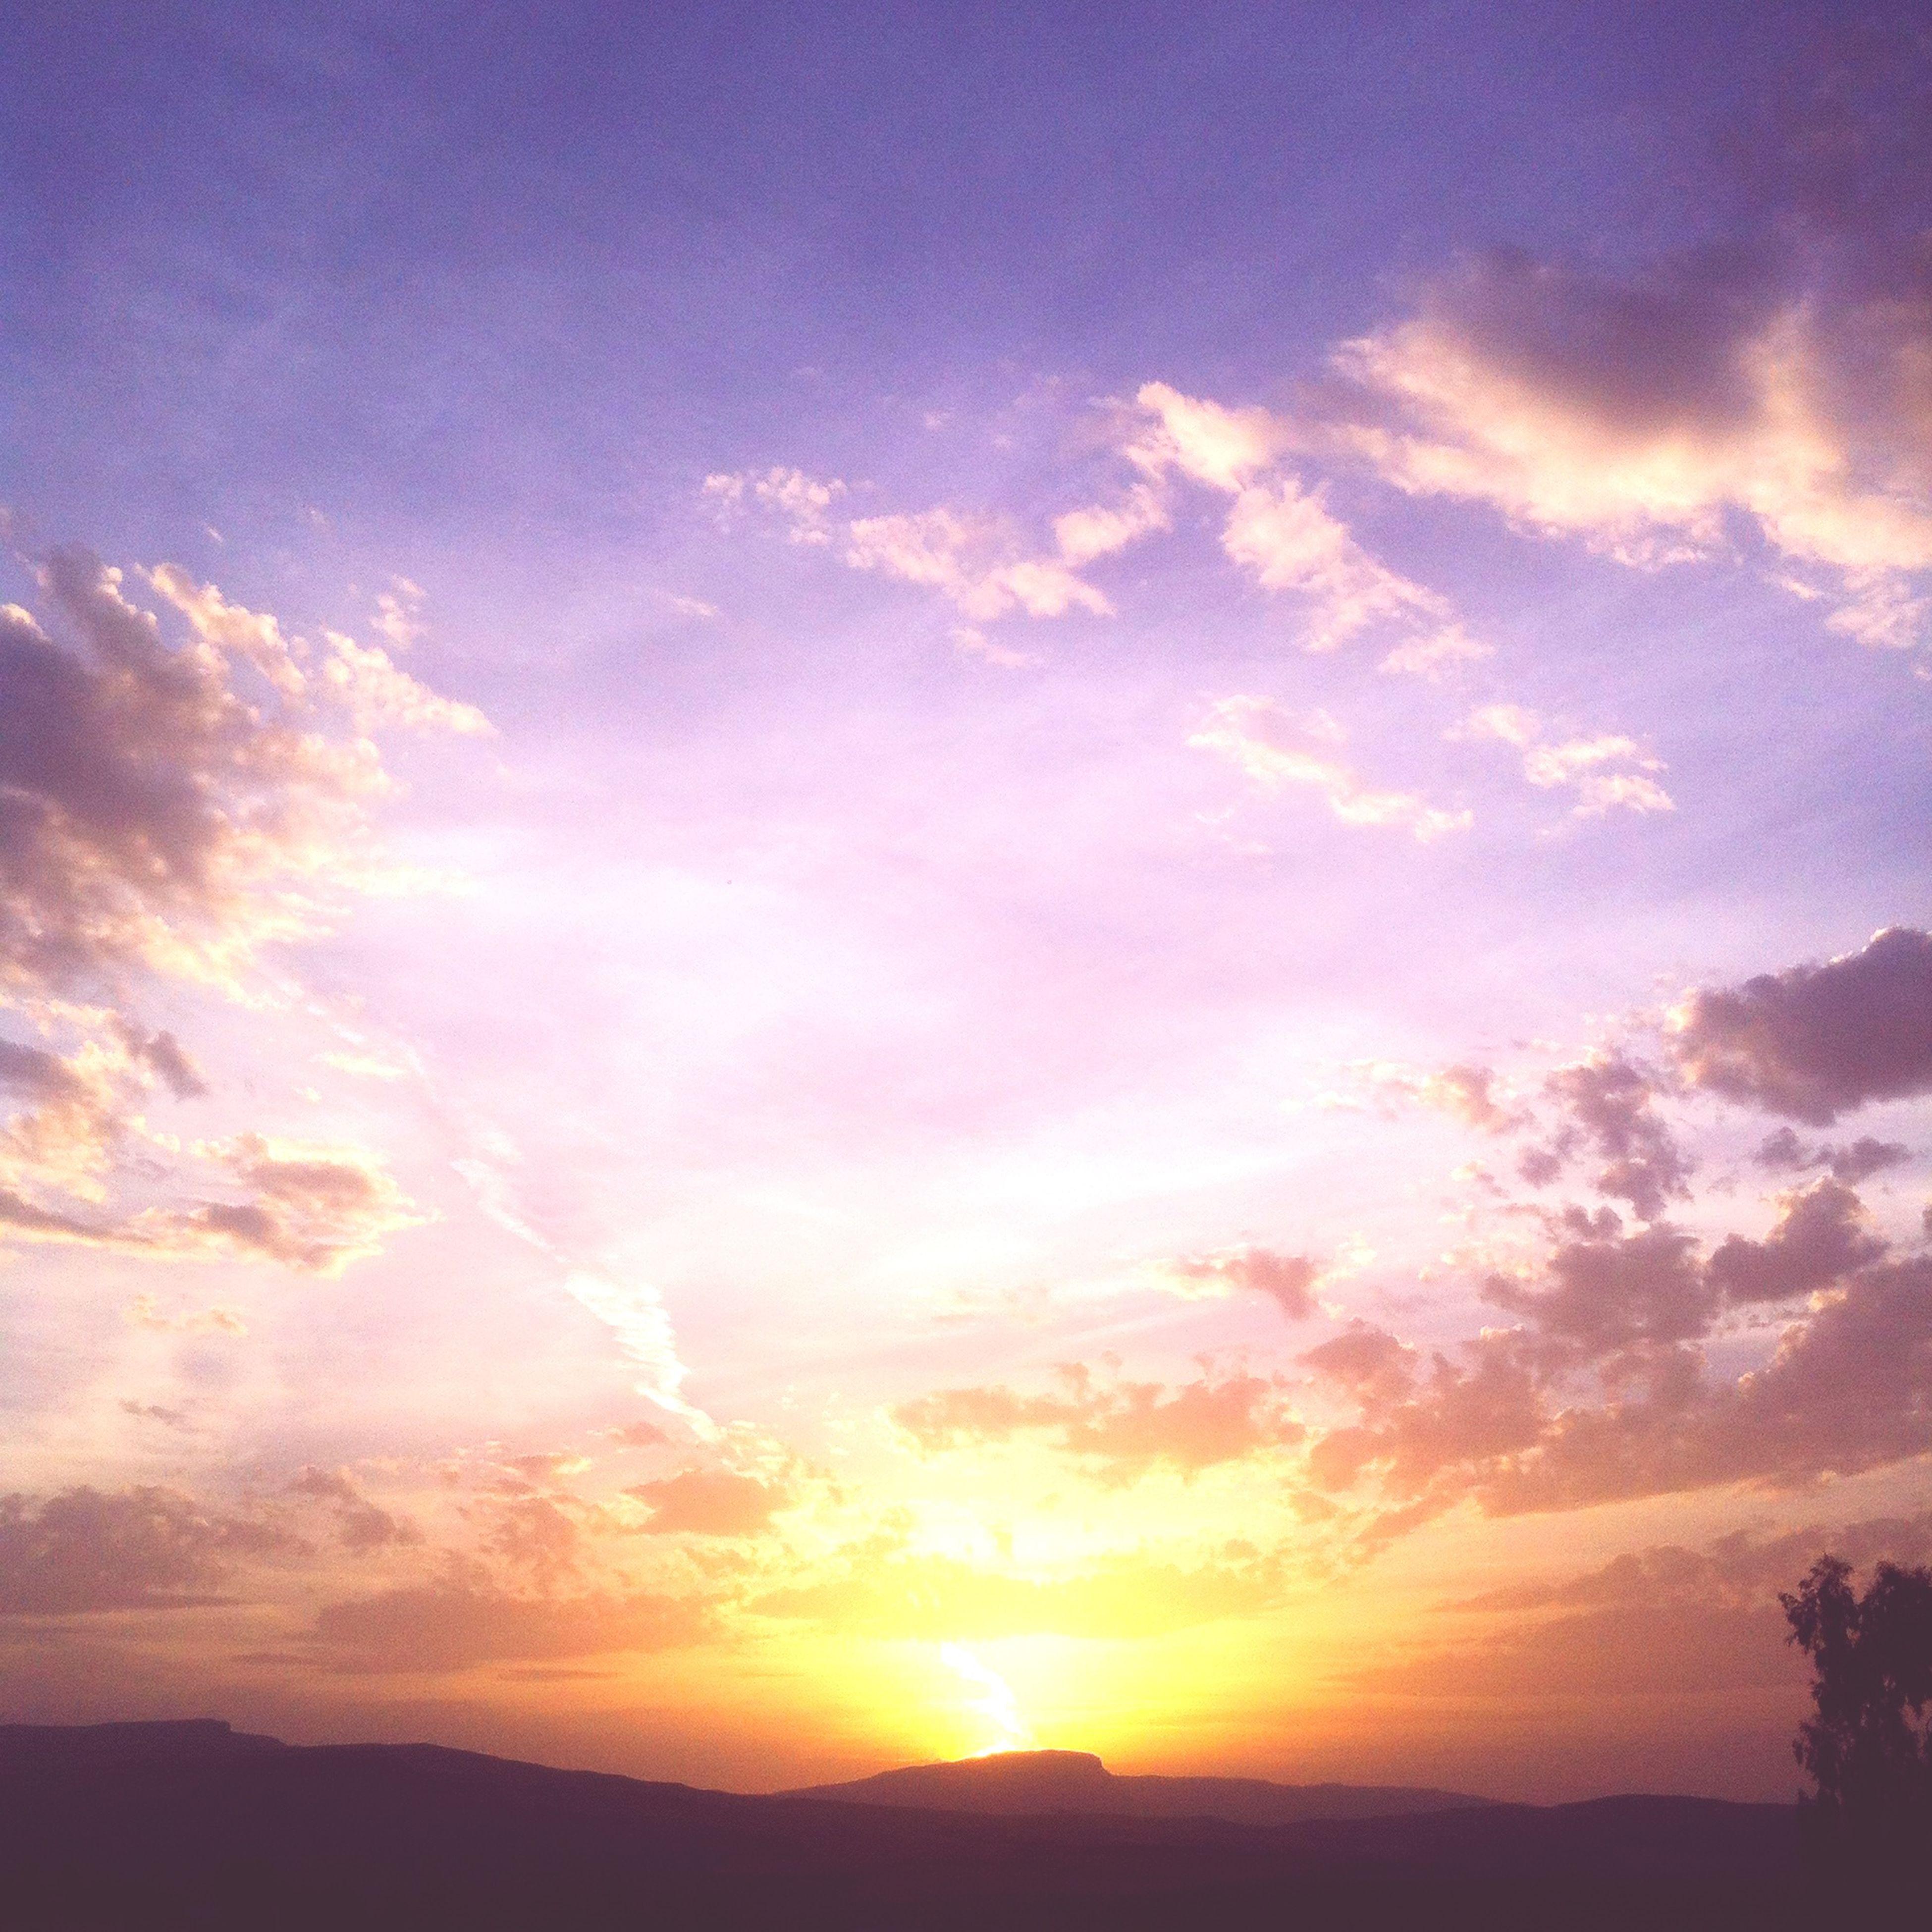 sunset, sun, sky, tranquil scene, scenics, beauty in nature, tranquility, silhouette, cloud - sky, sunbeam, sunlight, nature, landscape, idyllic, orange color, cloud, lens flare, outdoors, no people, field